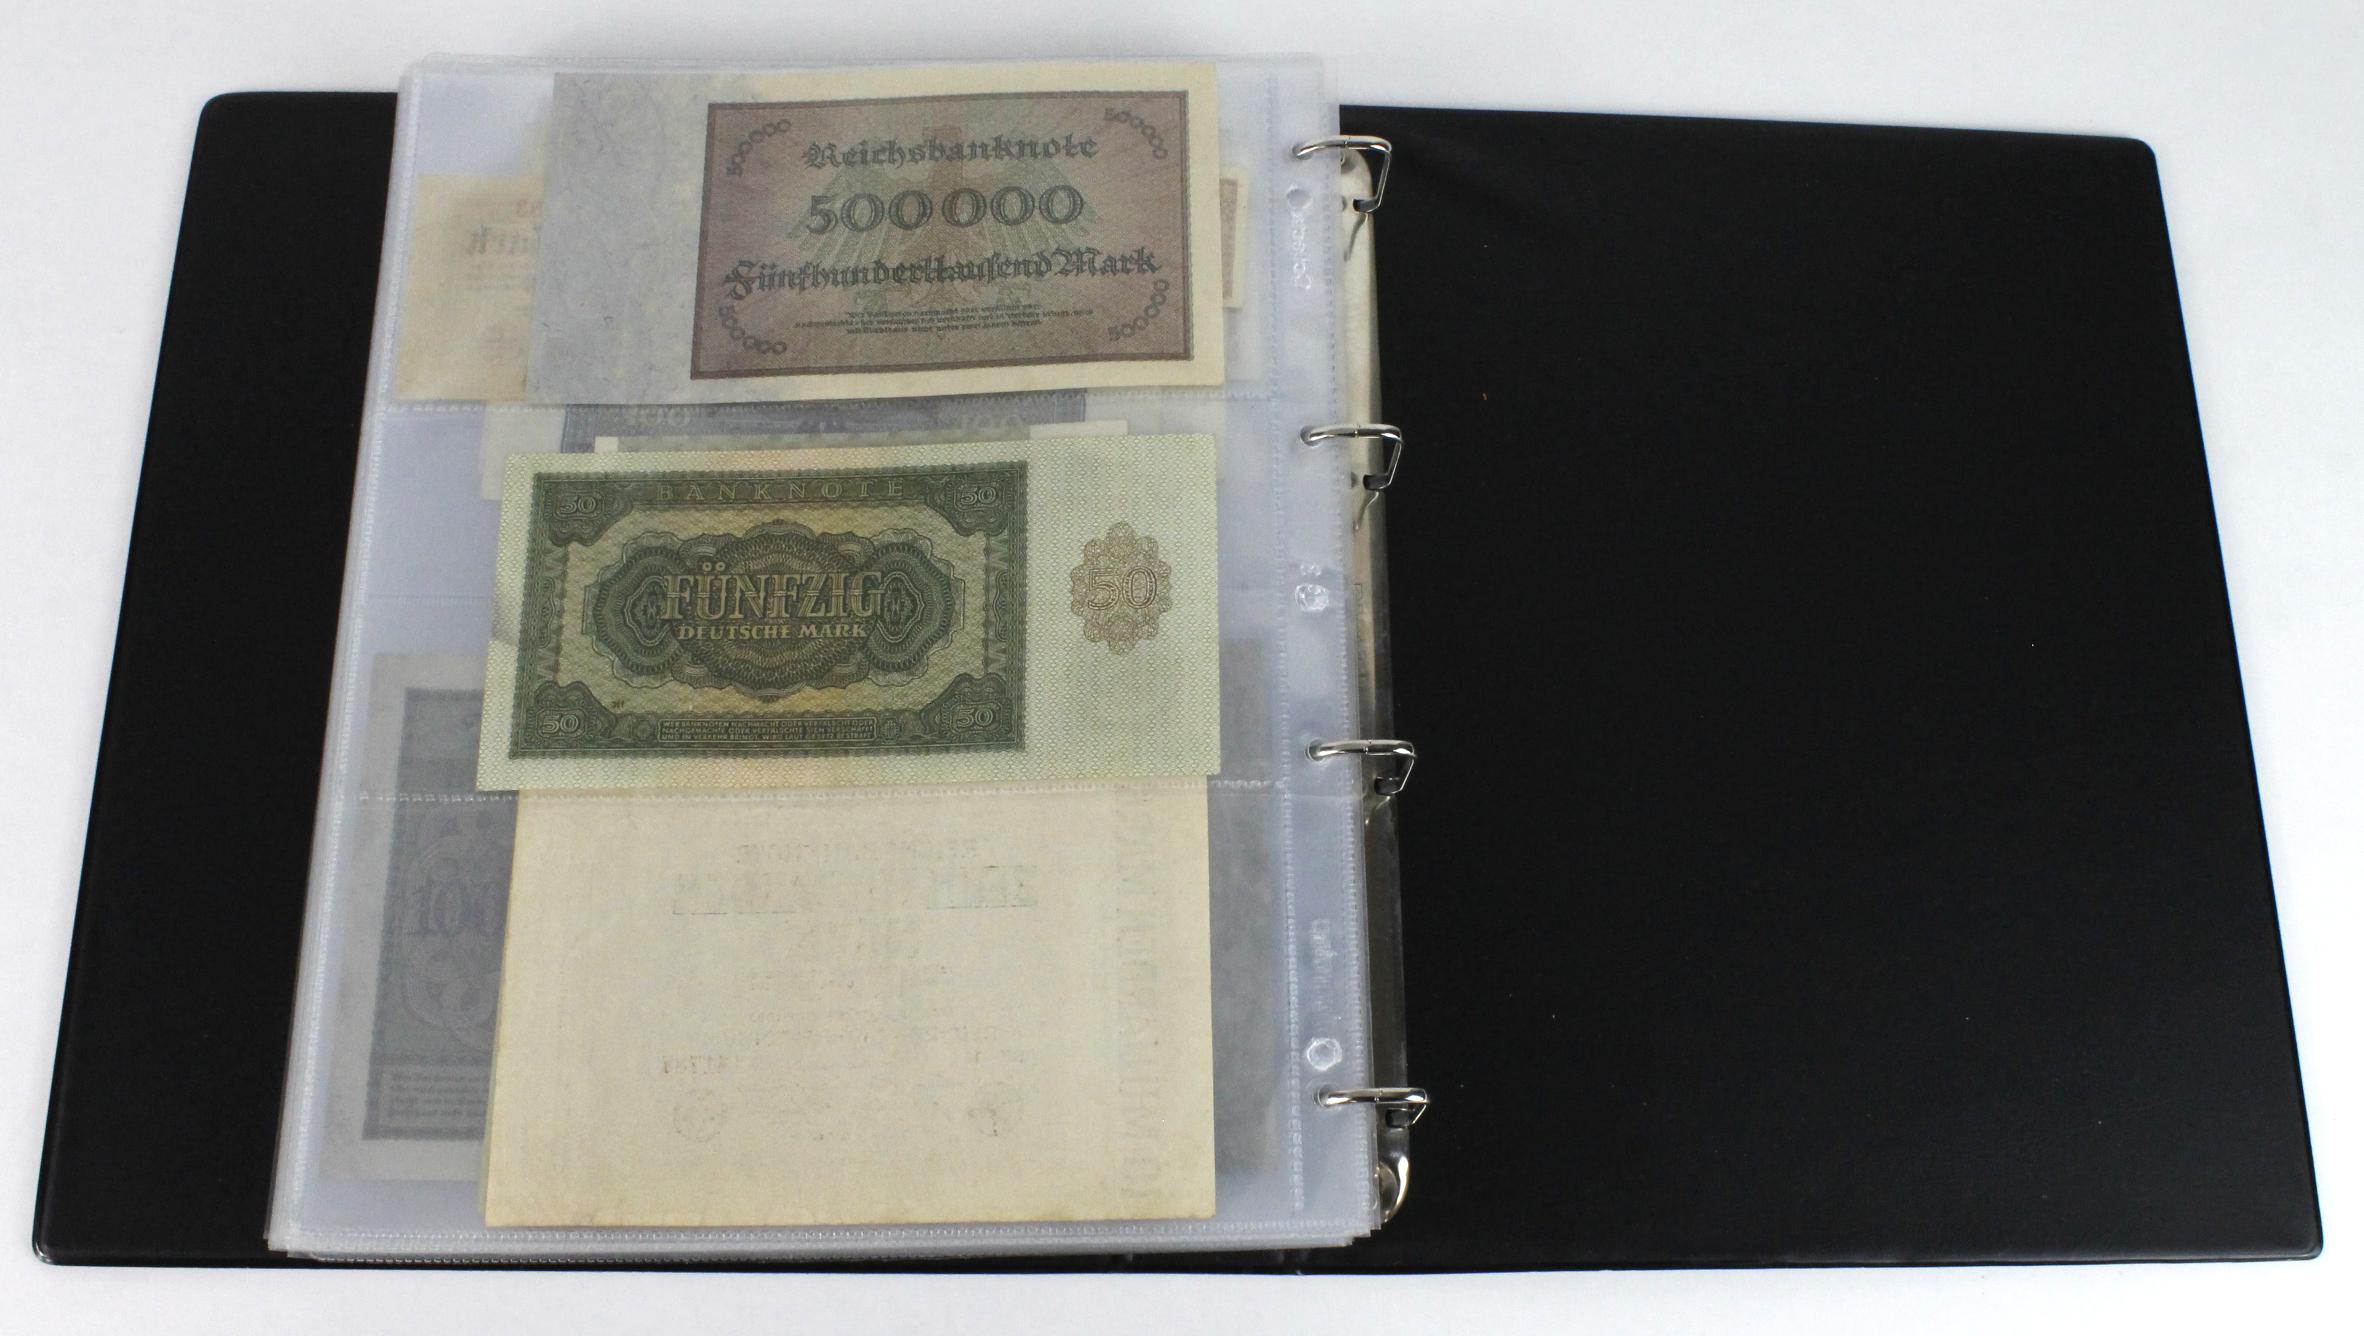 World (163), in banknote album including Bahamas, Spain, Sweden, Netherlands, Algeria, Macau, - Image 57 of 57